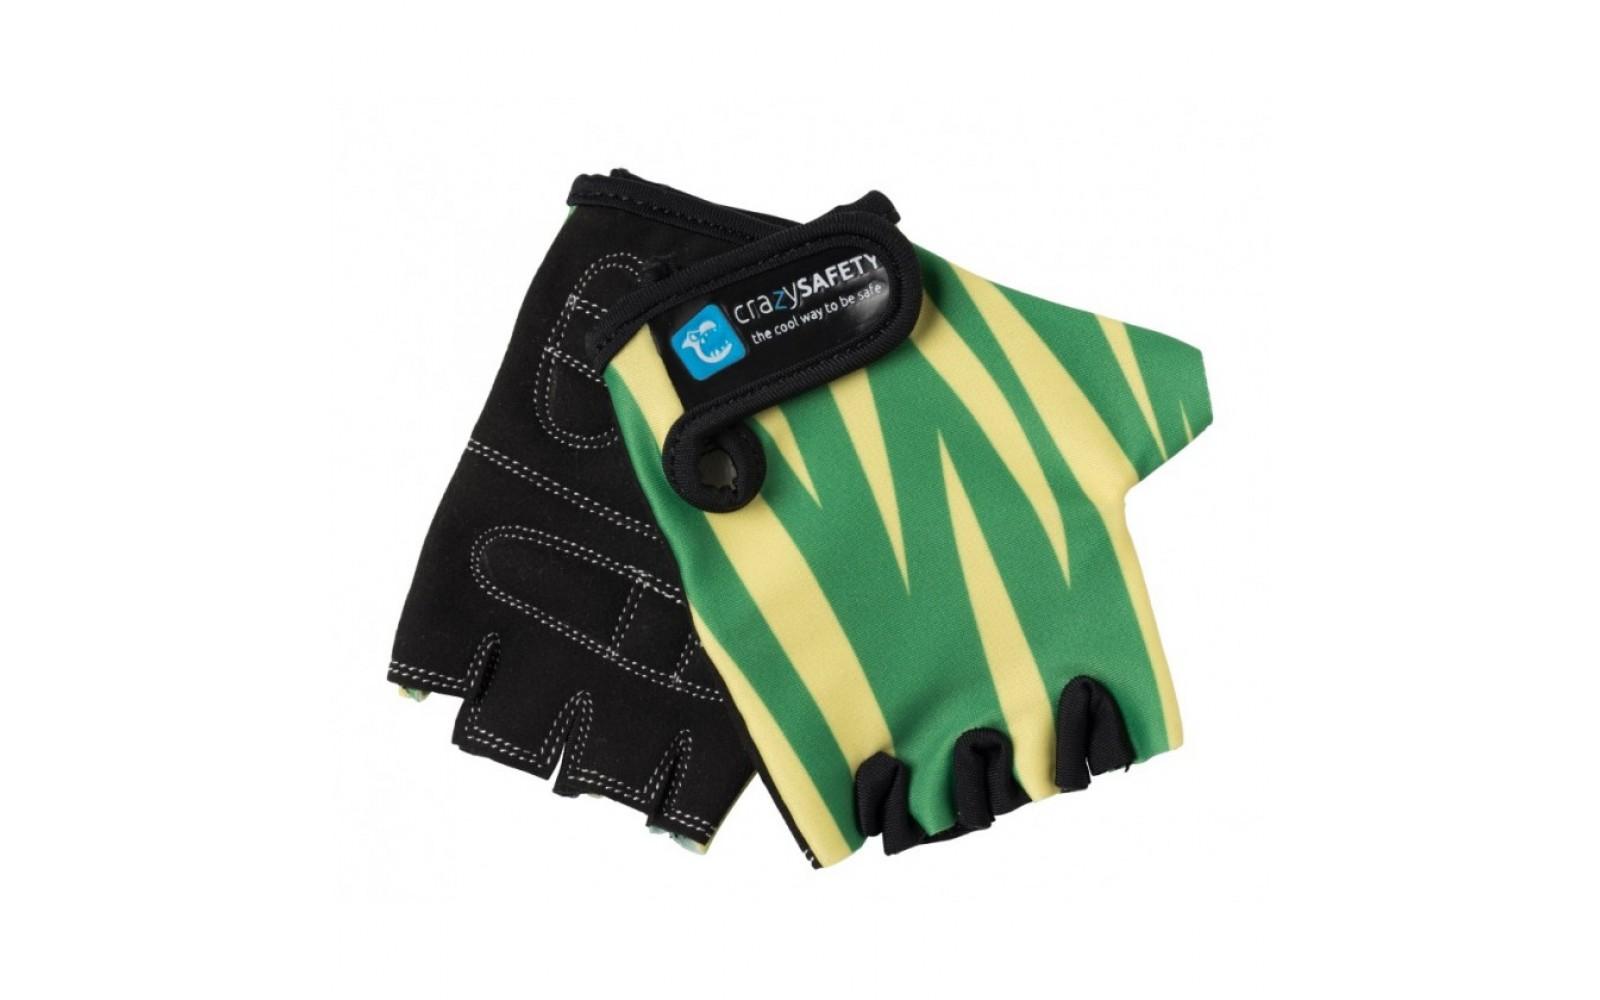 Перчатки Green Tiger (зелёный тигр) Crazy Safety